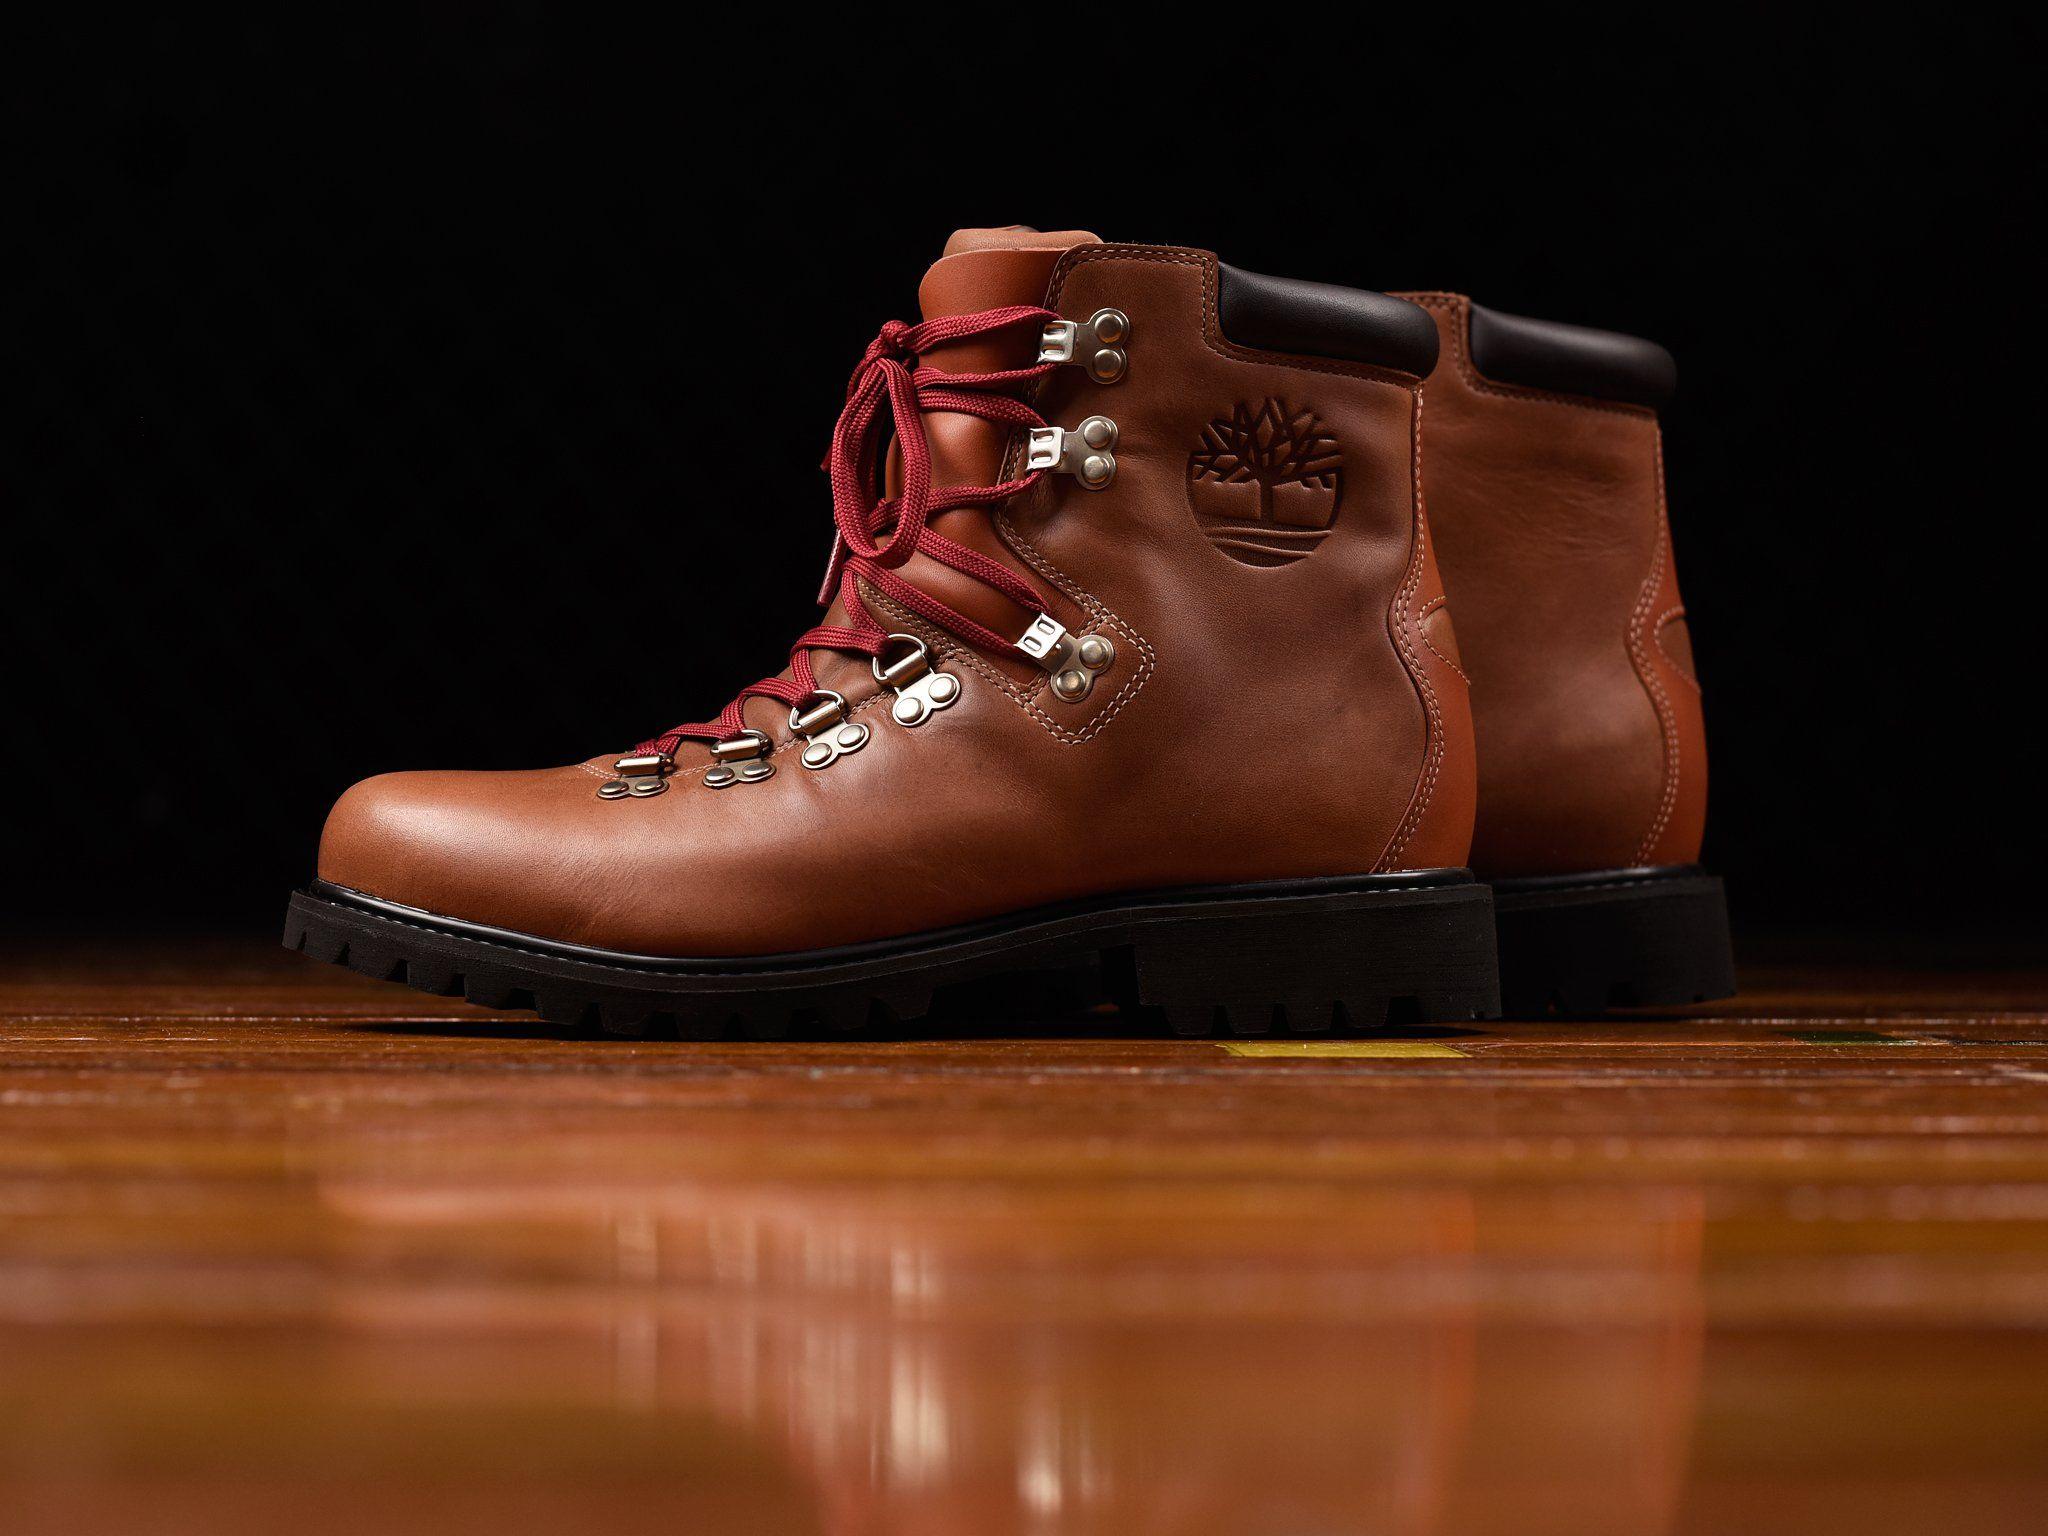 timberland 1978 hiking boots